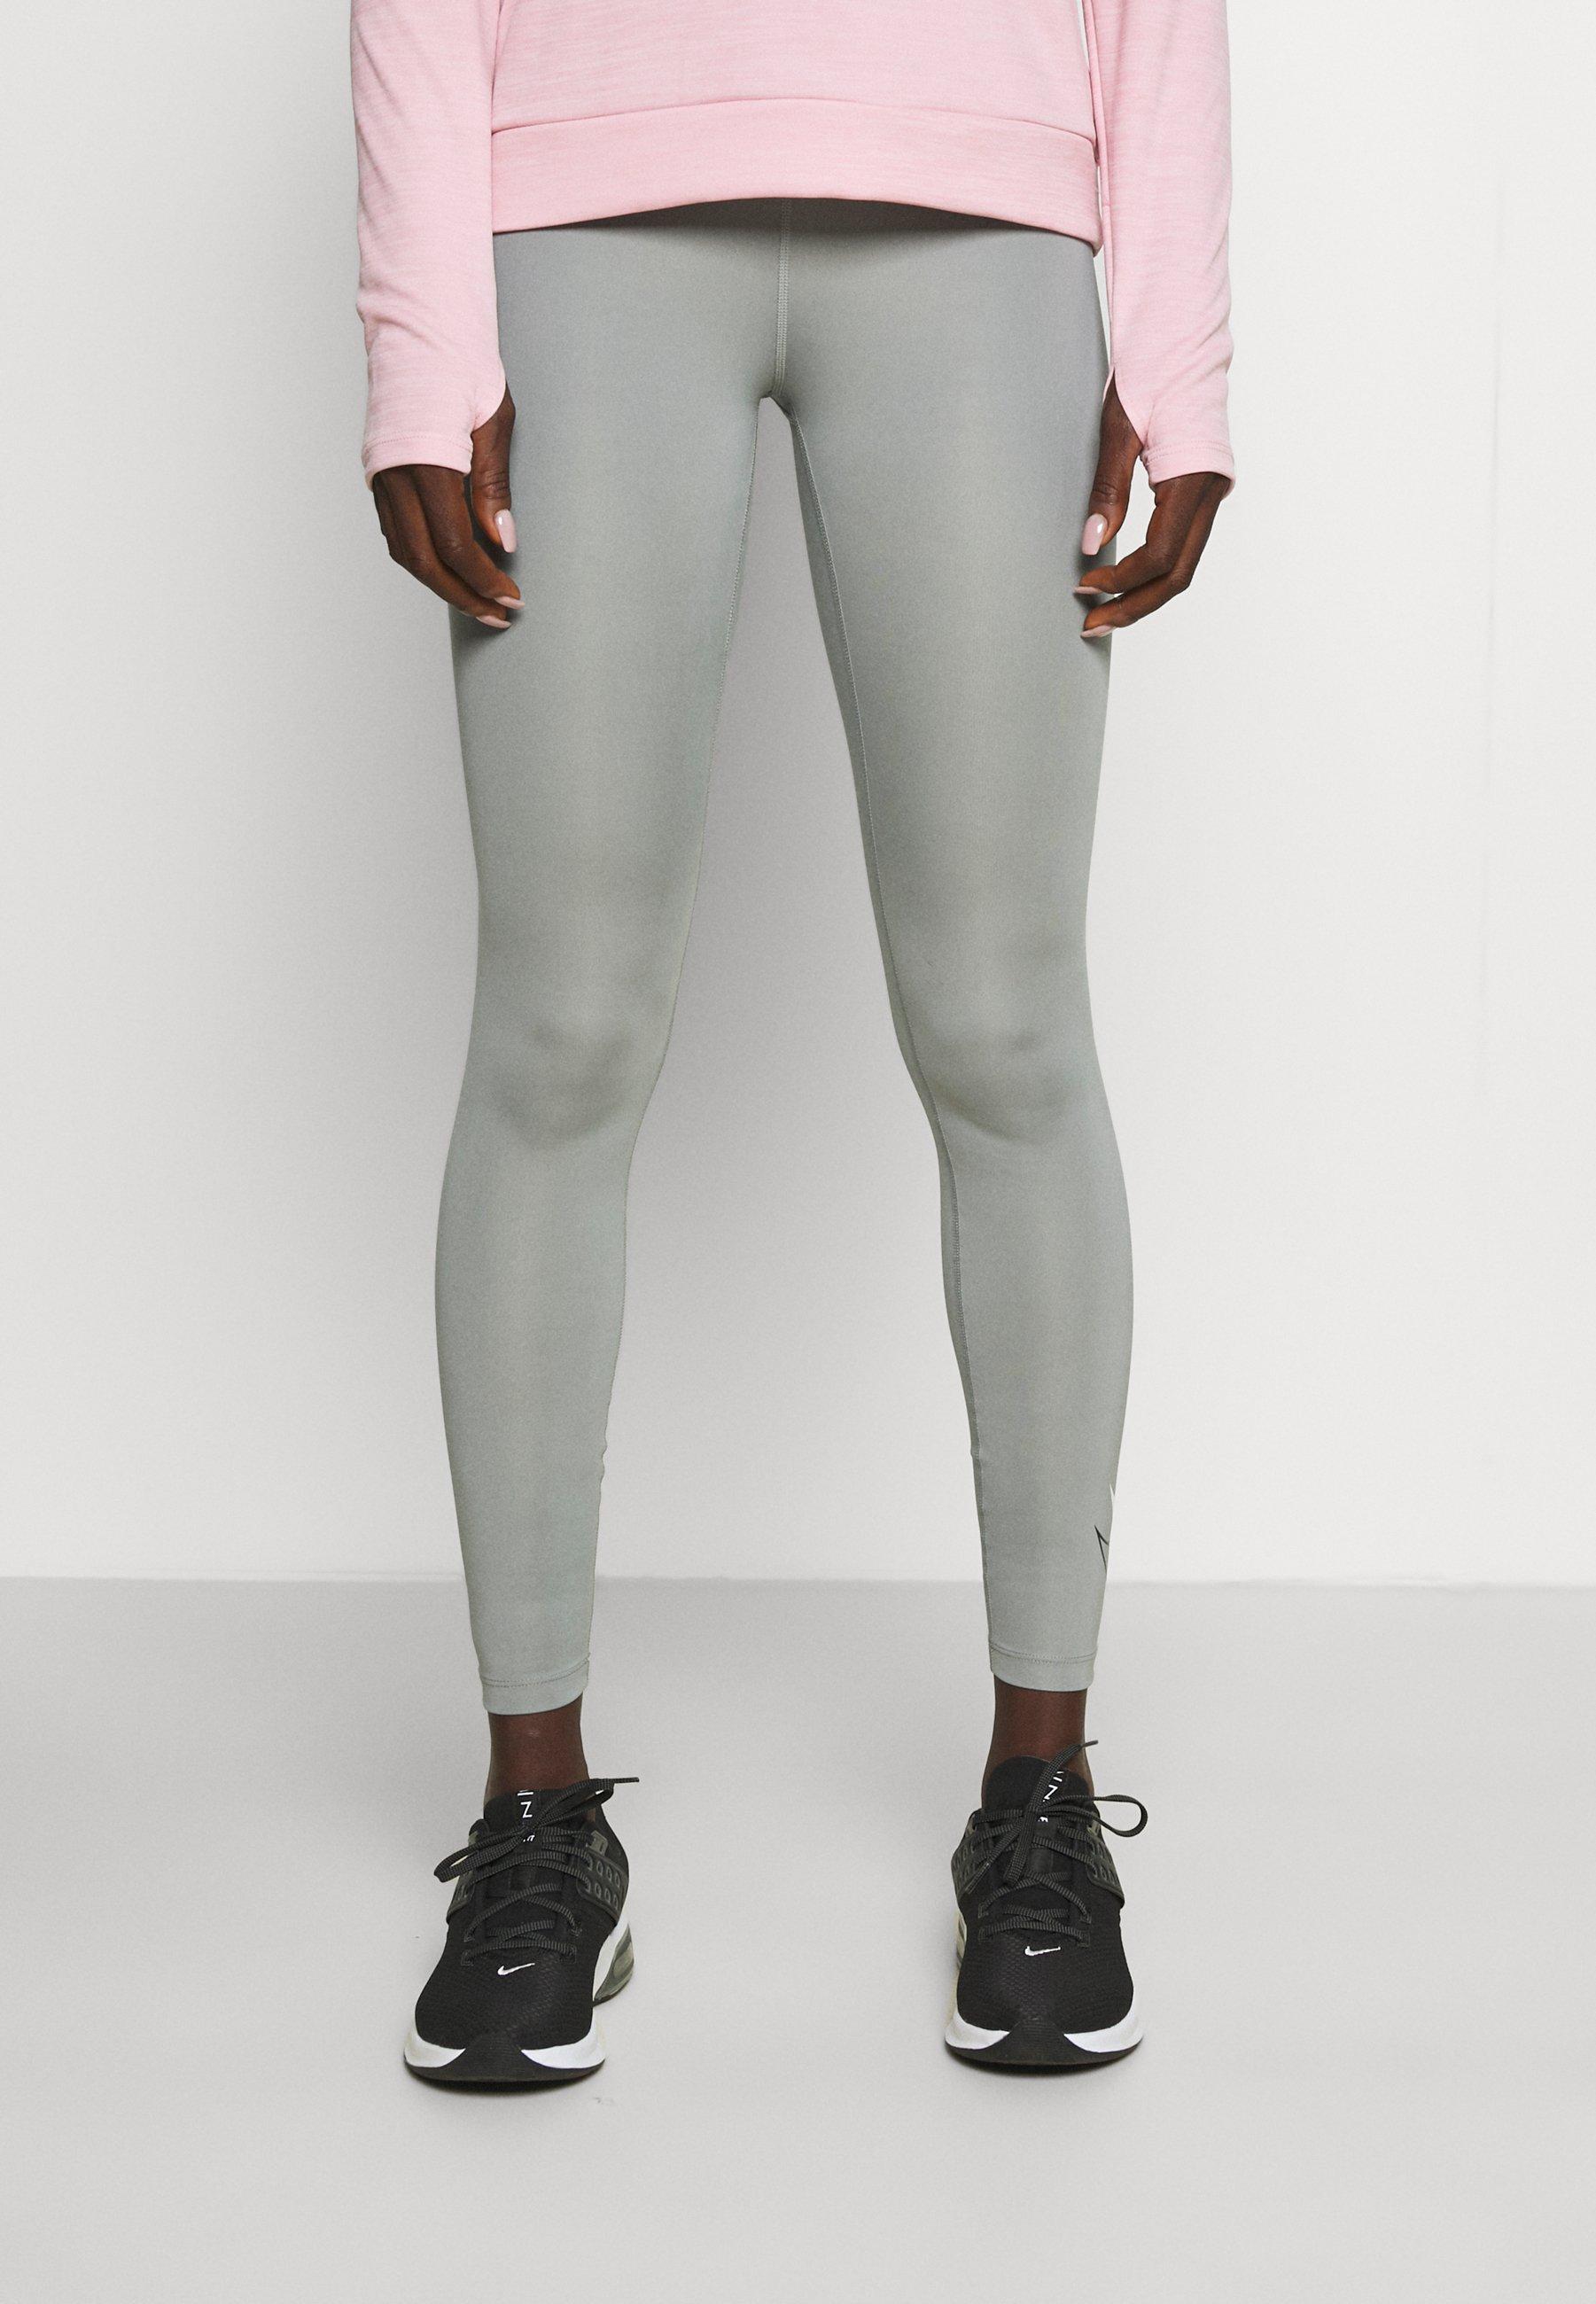 Femme RUN - Collants